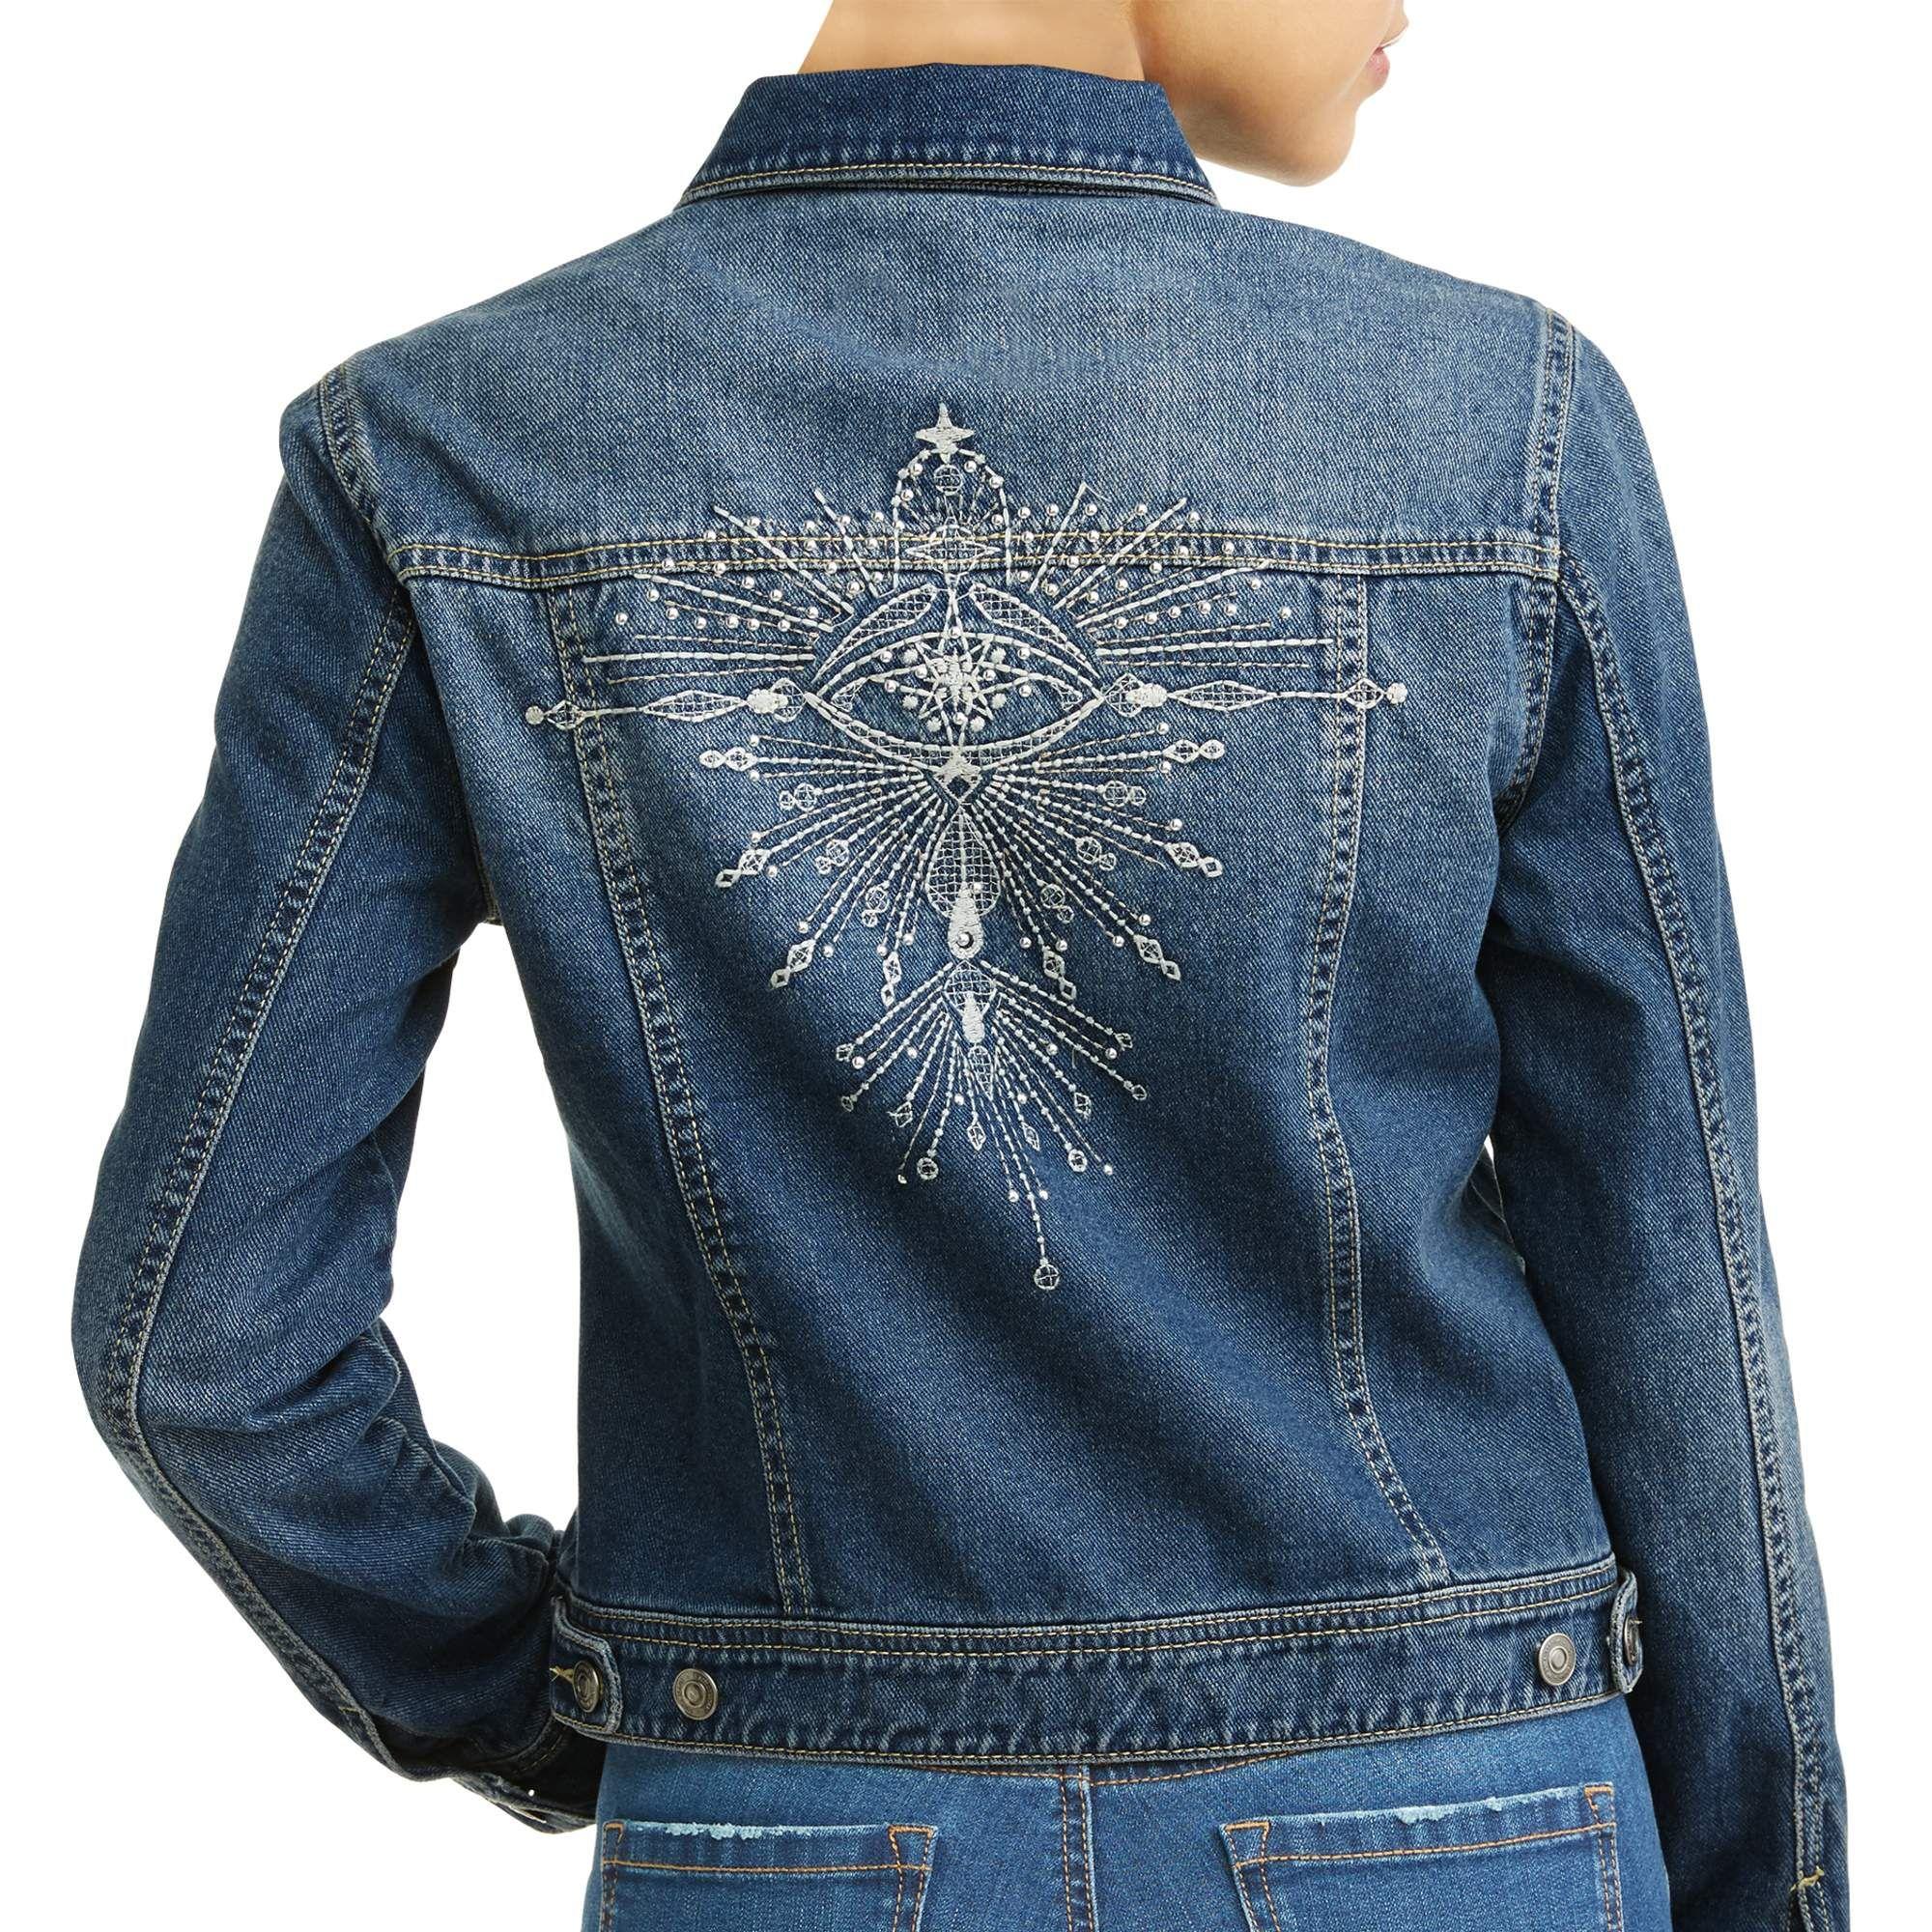 6f647604c0ff6 Angela Embroidered Evil Eye Denim Jacket. Angela Embroidered Evil Eye Denim  Jacket Women s (Medium Indigo Wash). Sofía Jeans by Sofía Vergara ...